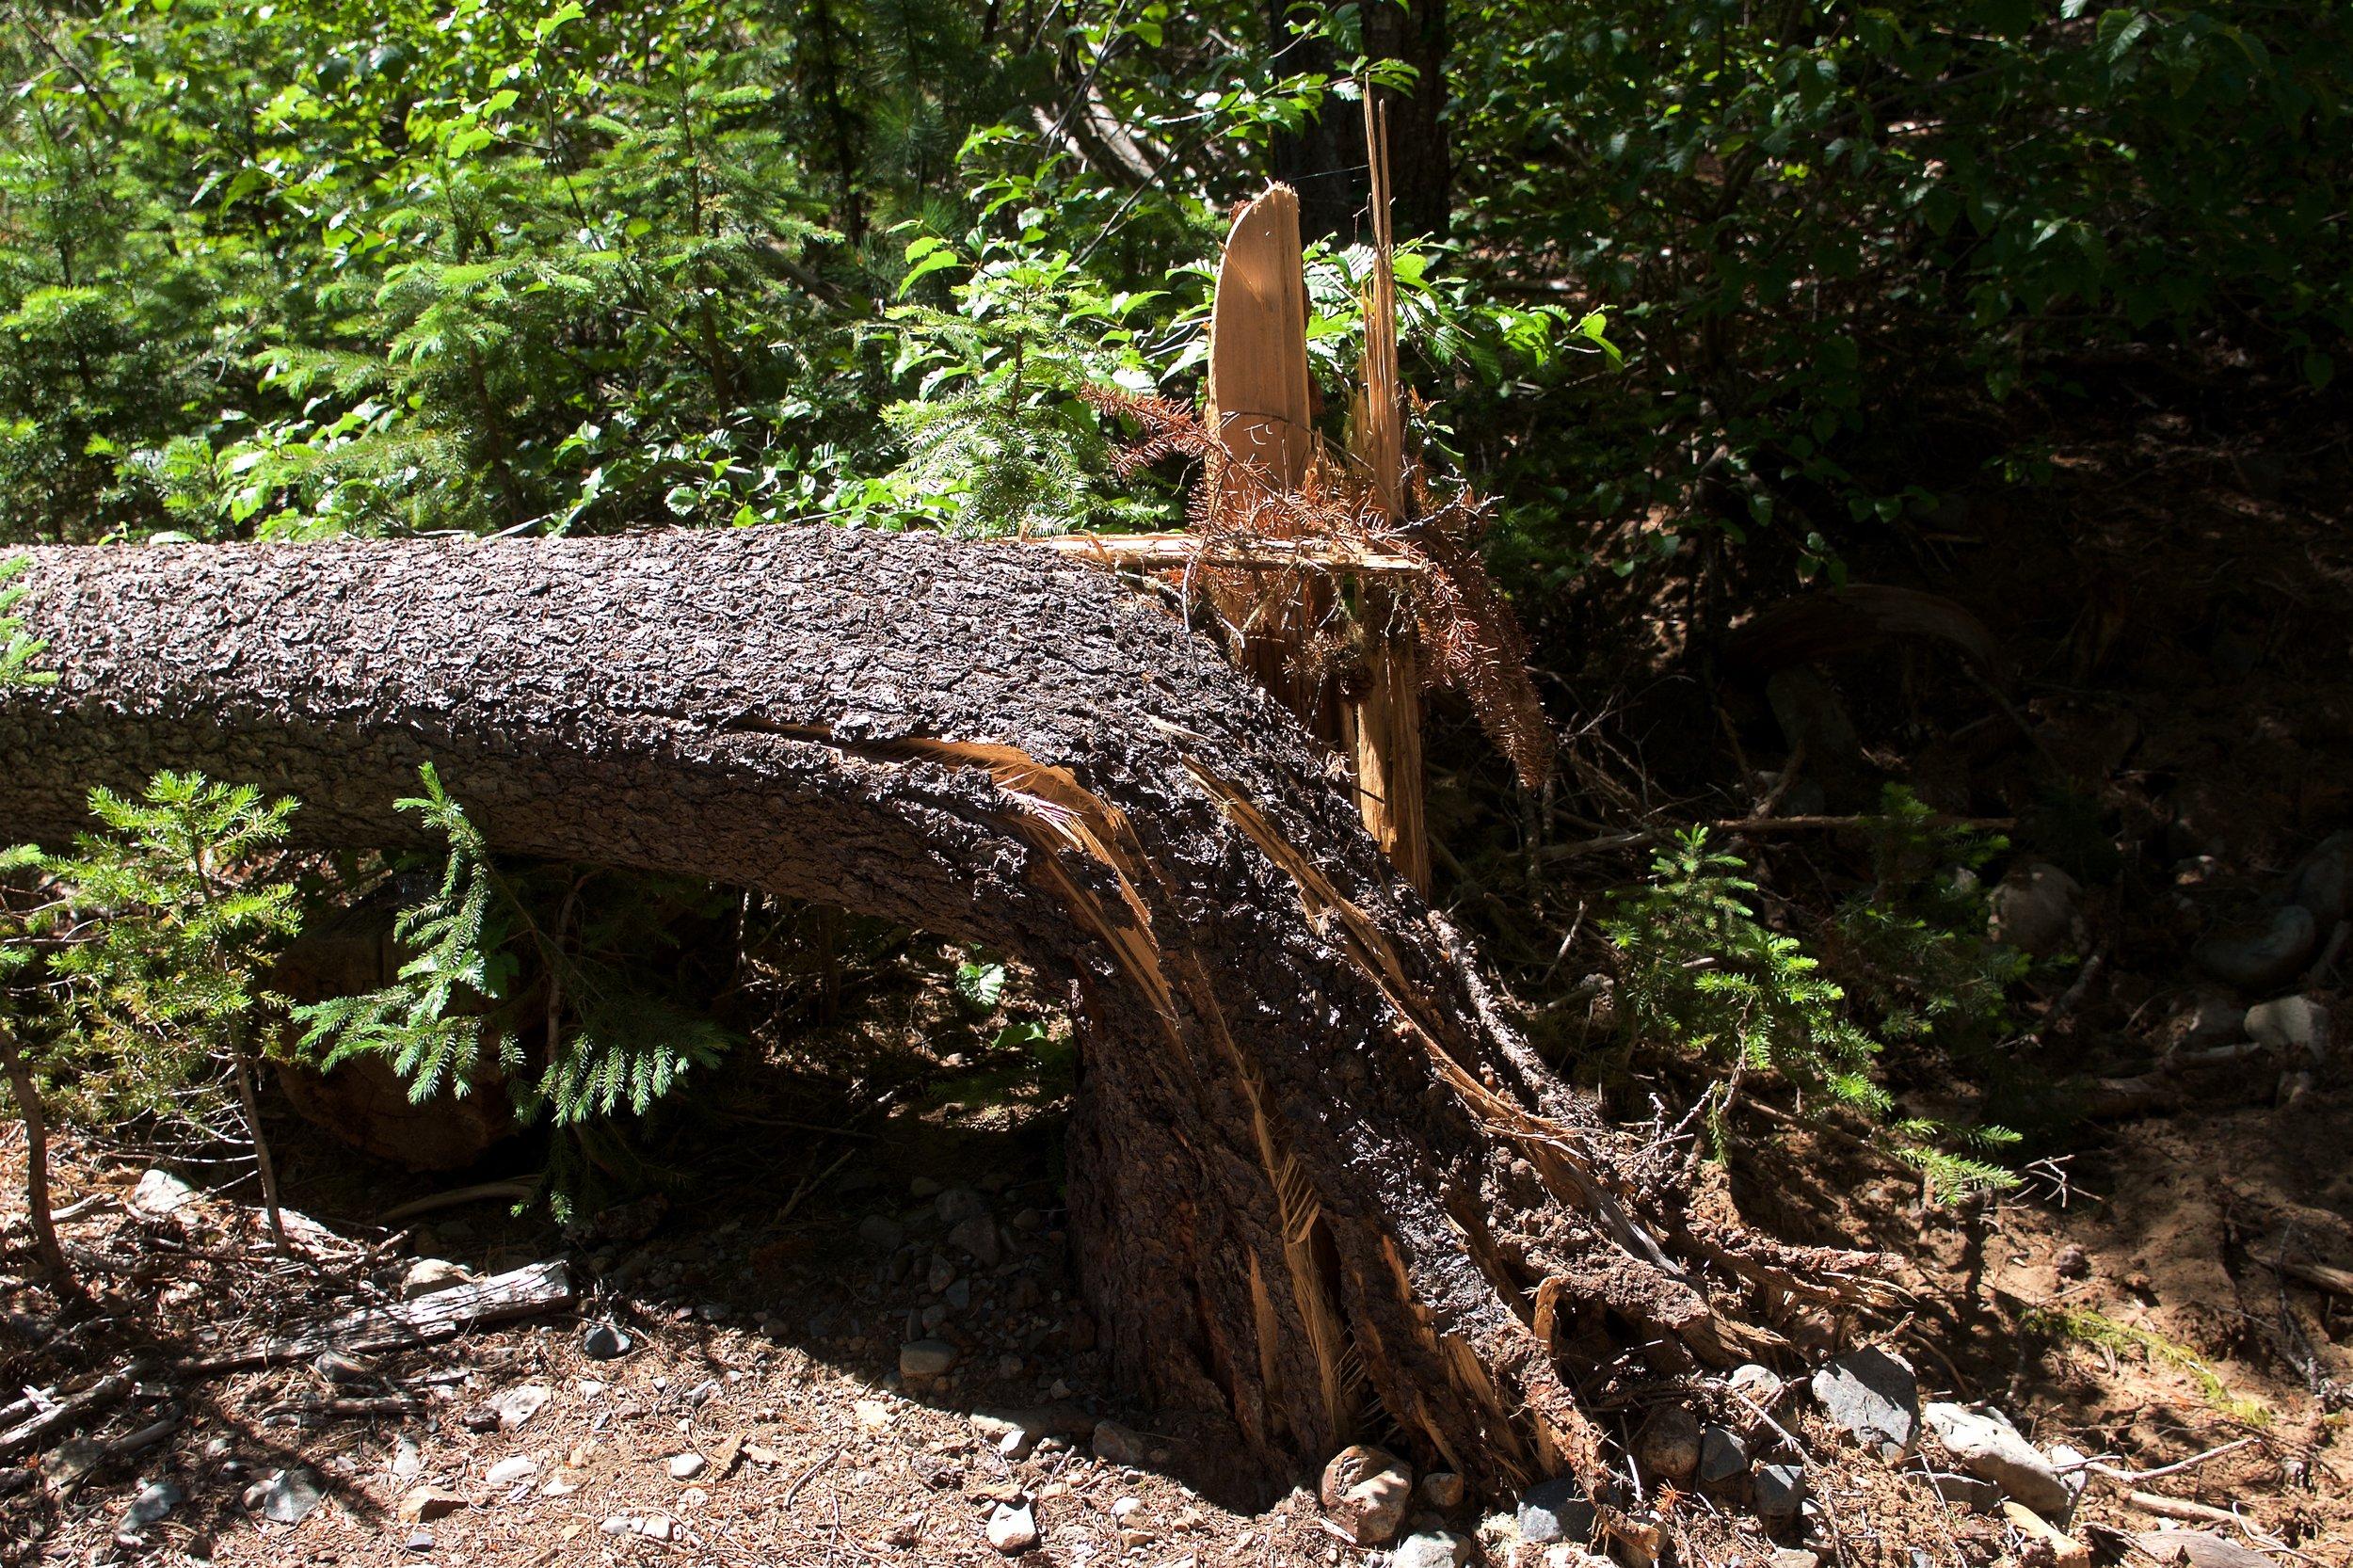 We came across almost three dozen trees fallen across the trail